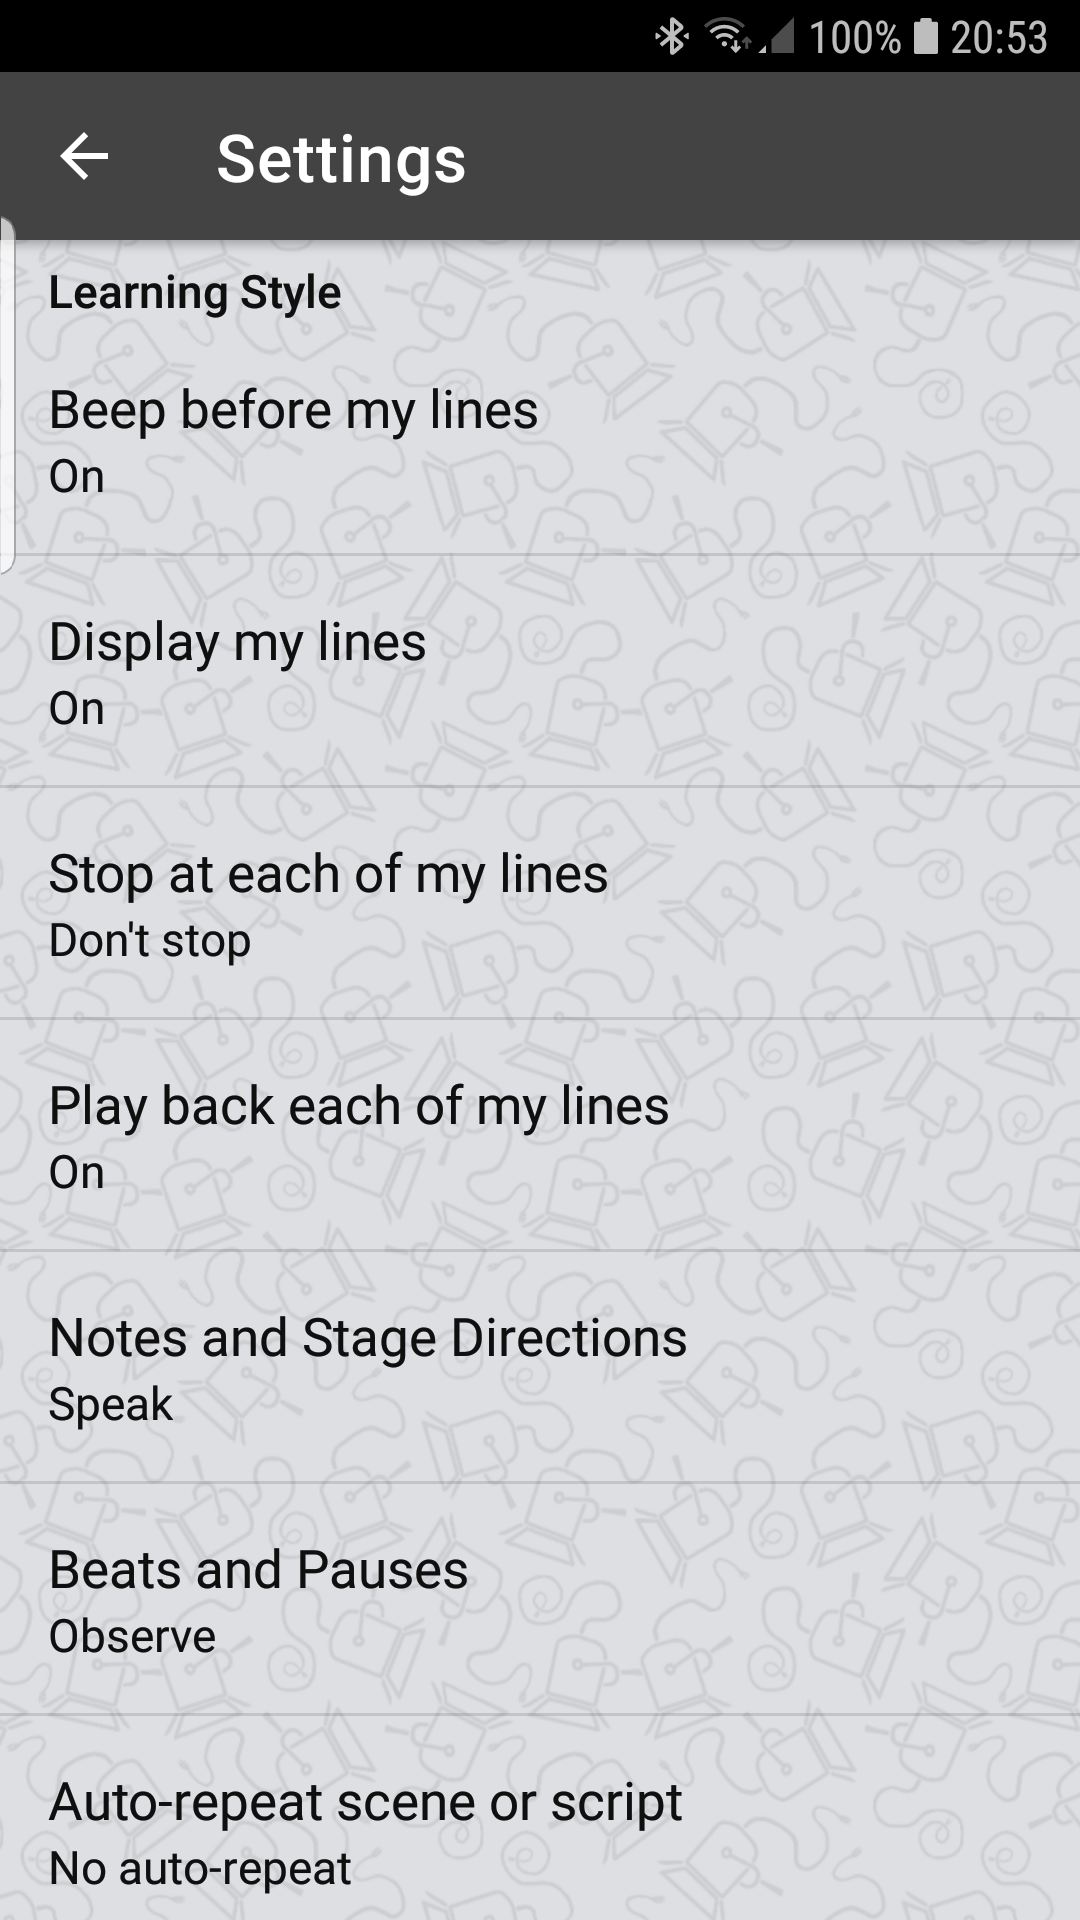 Script Rehearser - The world's favourite rehearsing app